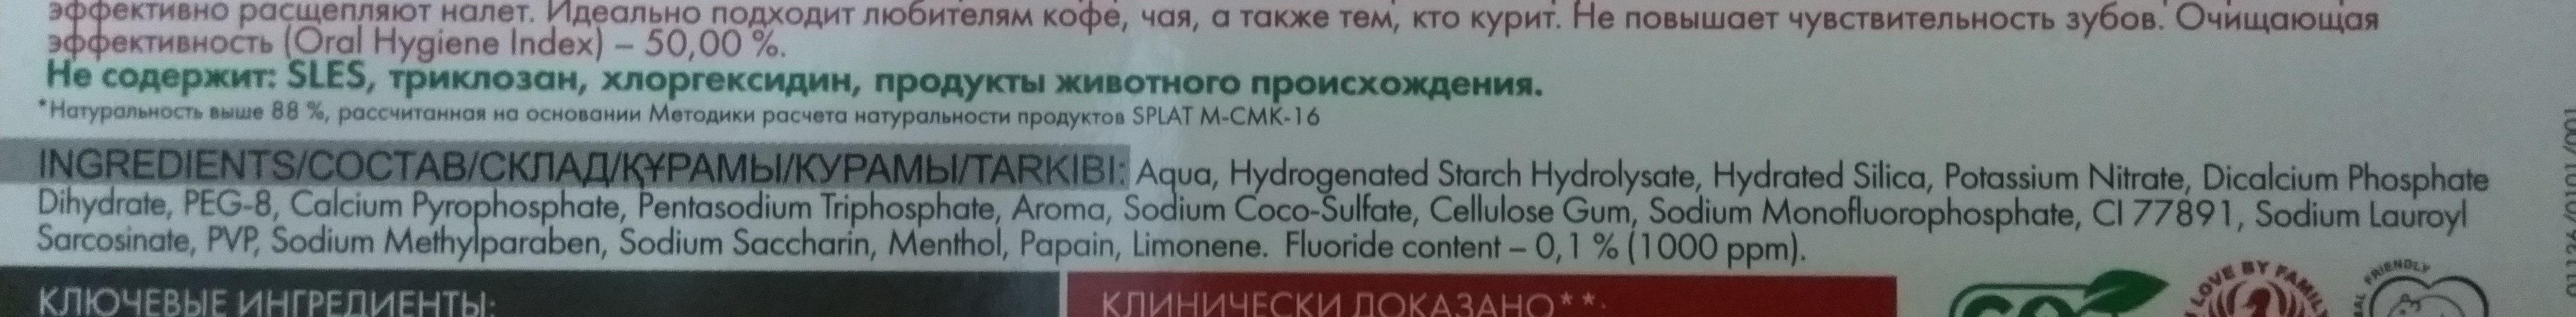 Зубная паста серии Professional «SPLAT (СПЛАТ) White Plus / Отбеливание плюс» - Ingredients - ru